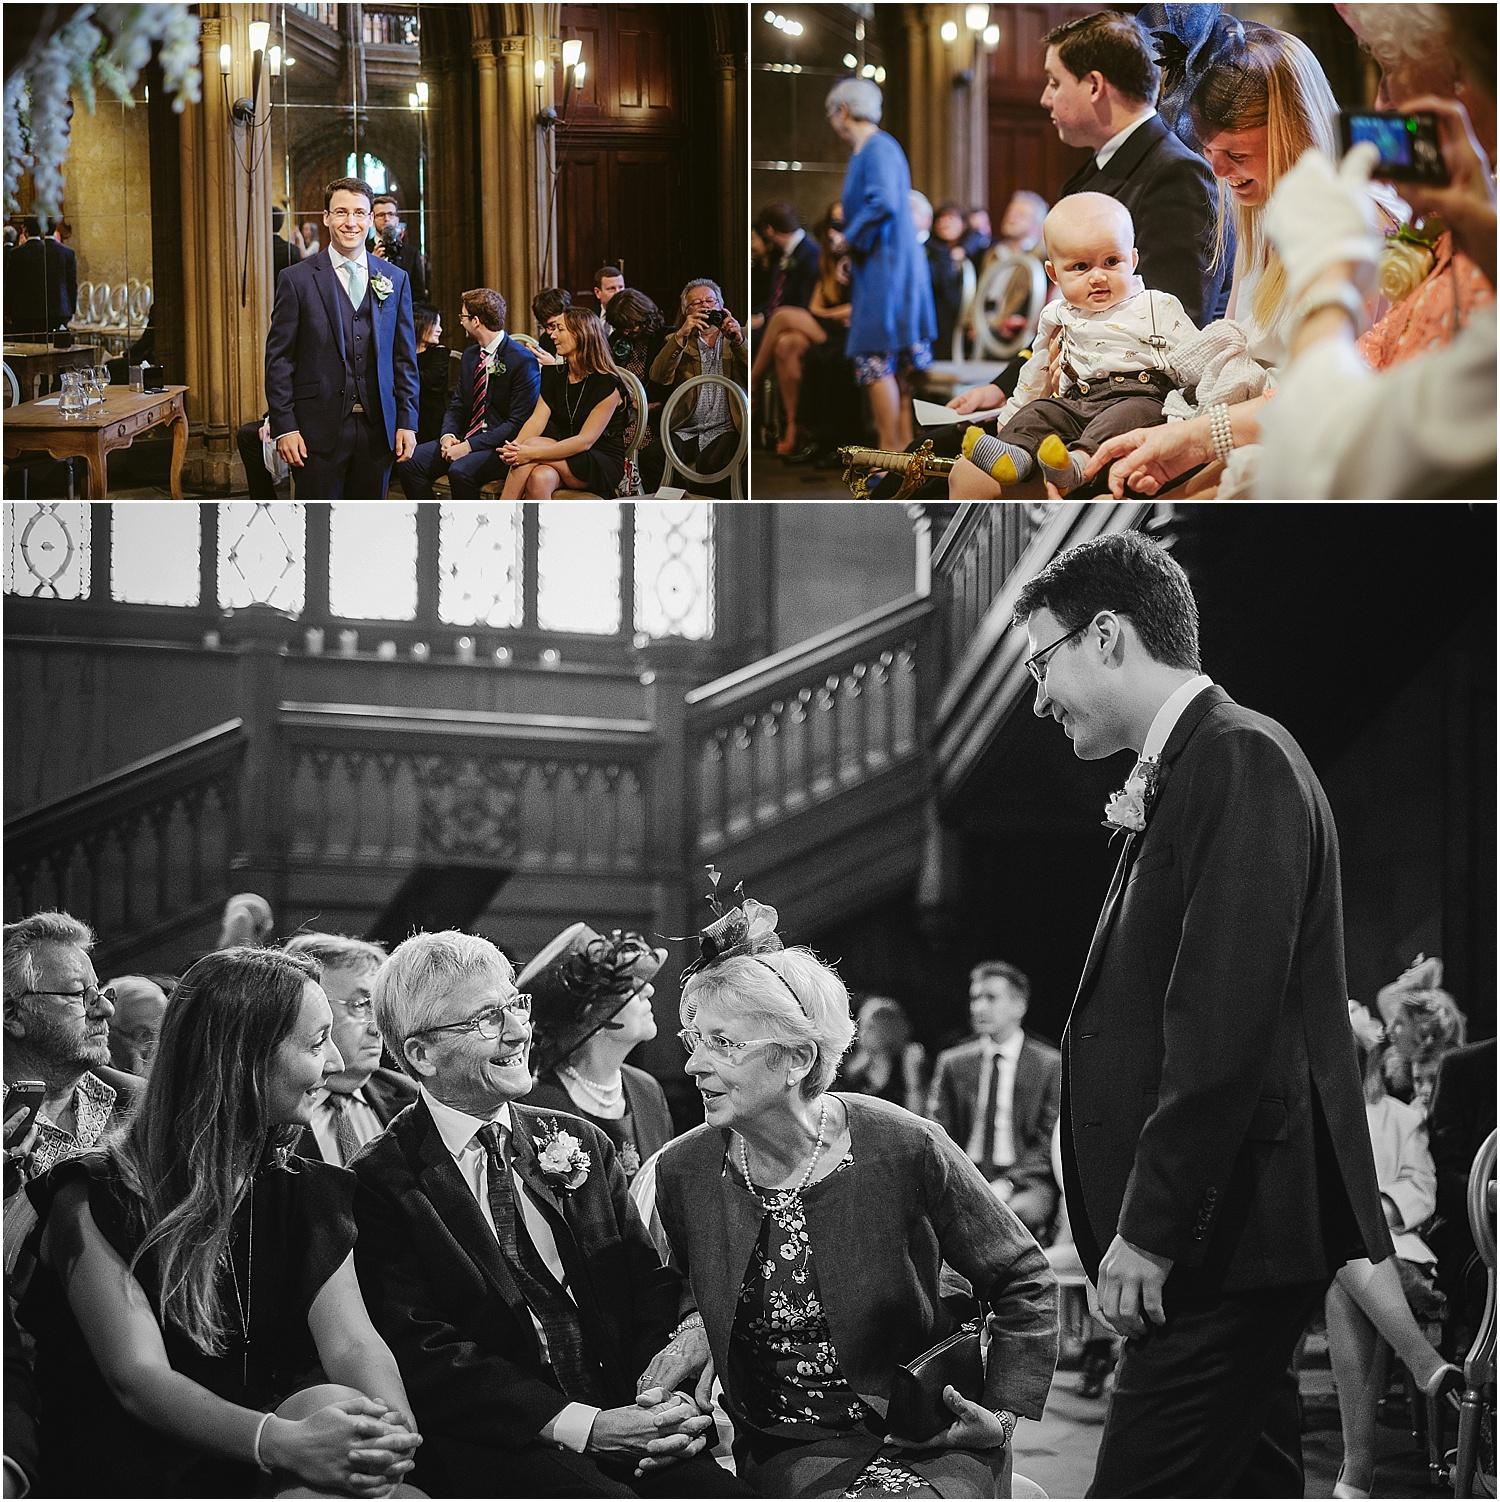 Wedding photos at Matfen Hall 019.jpg